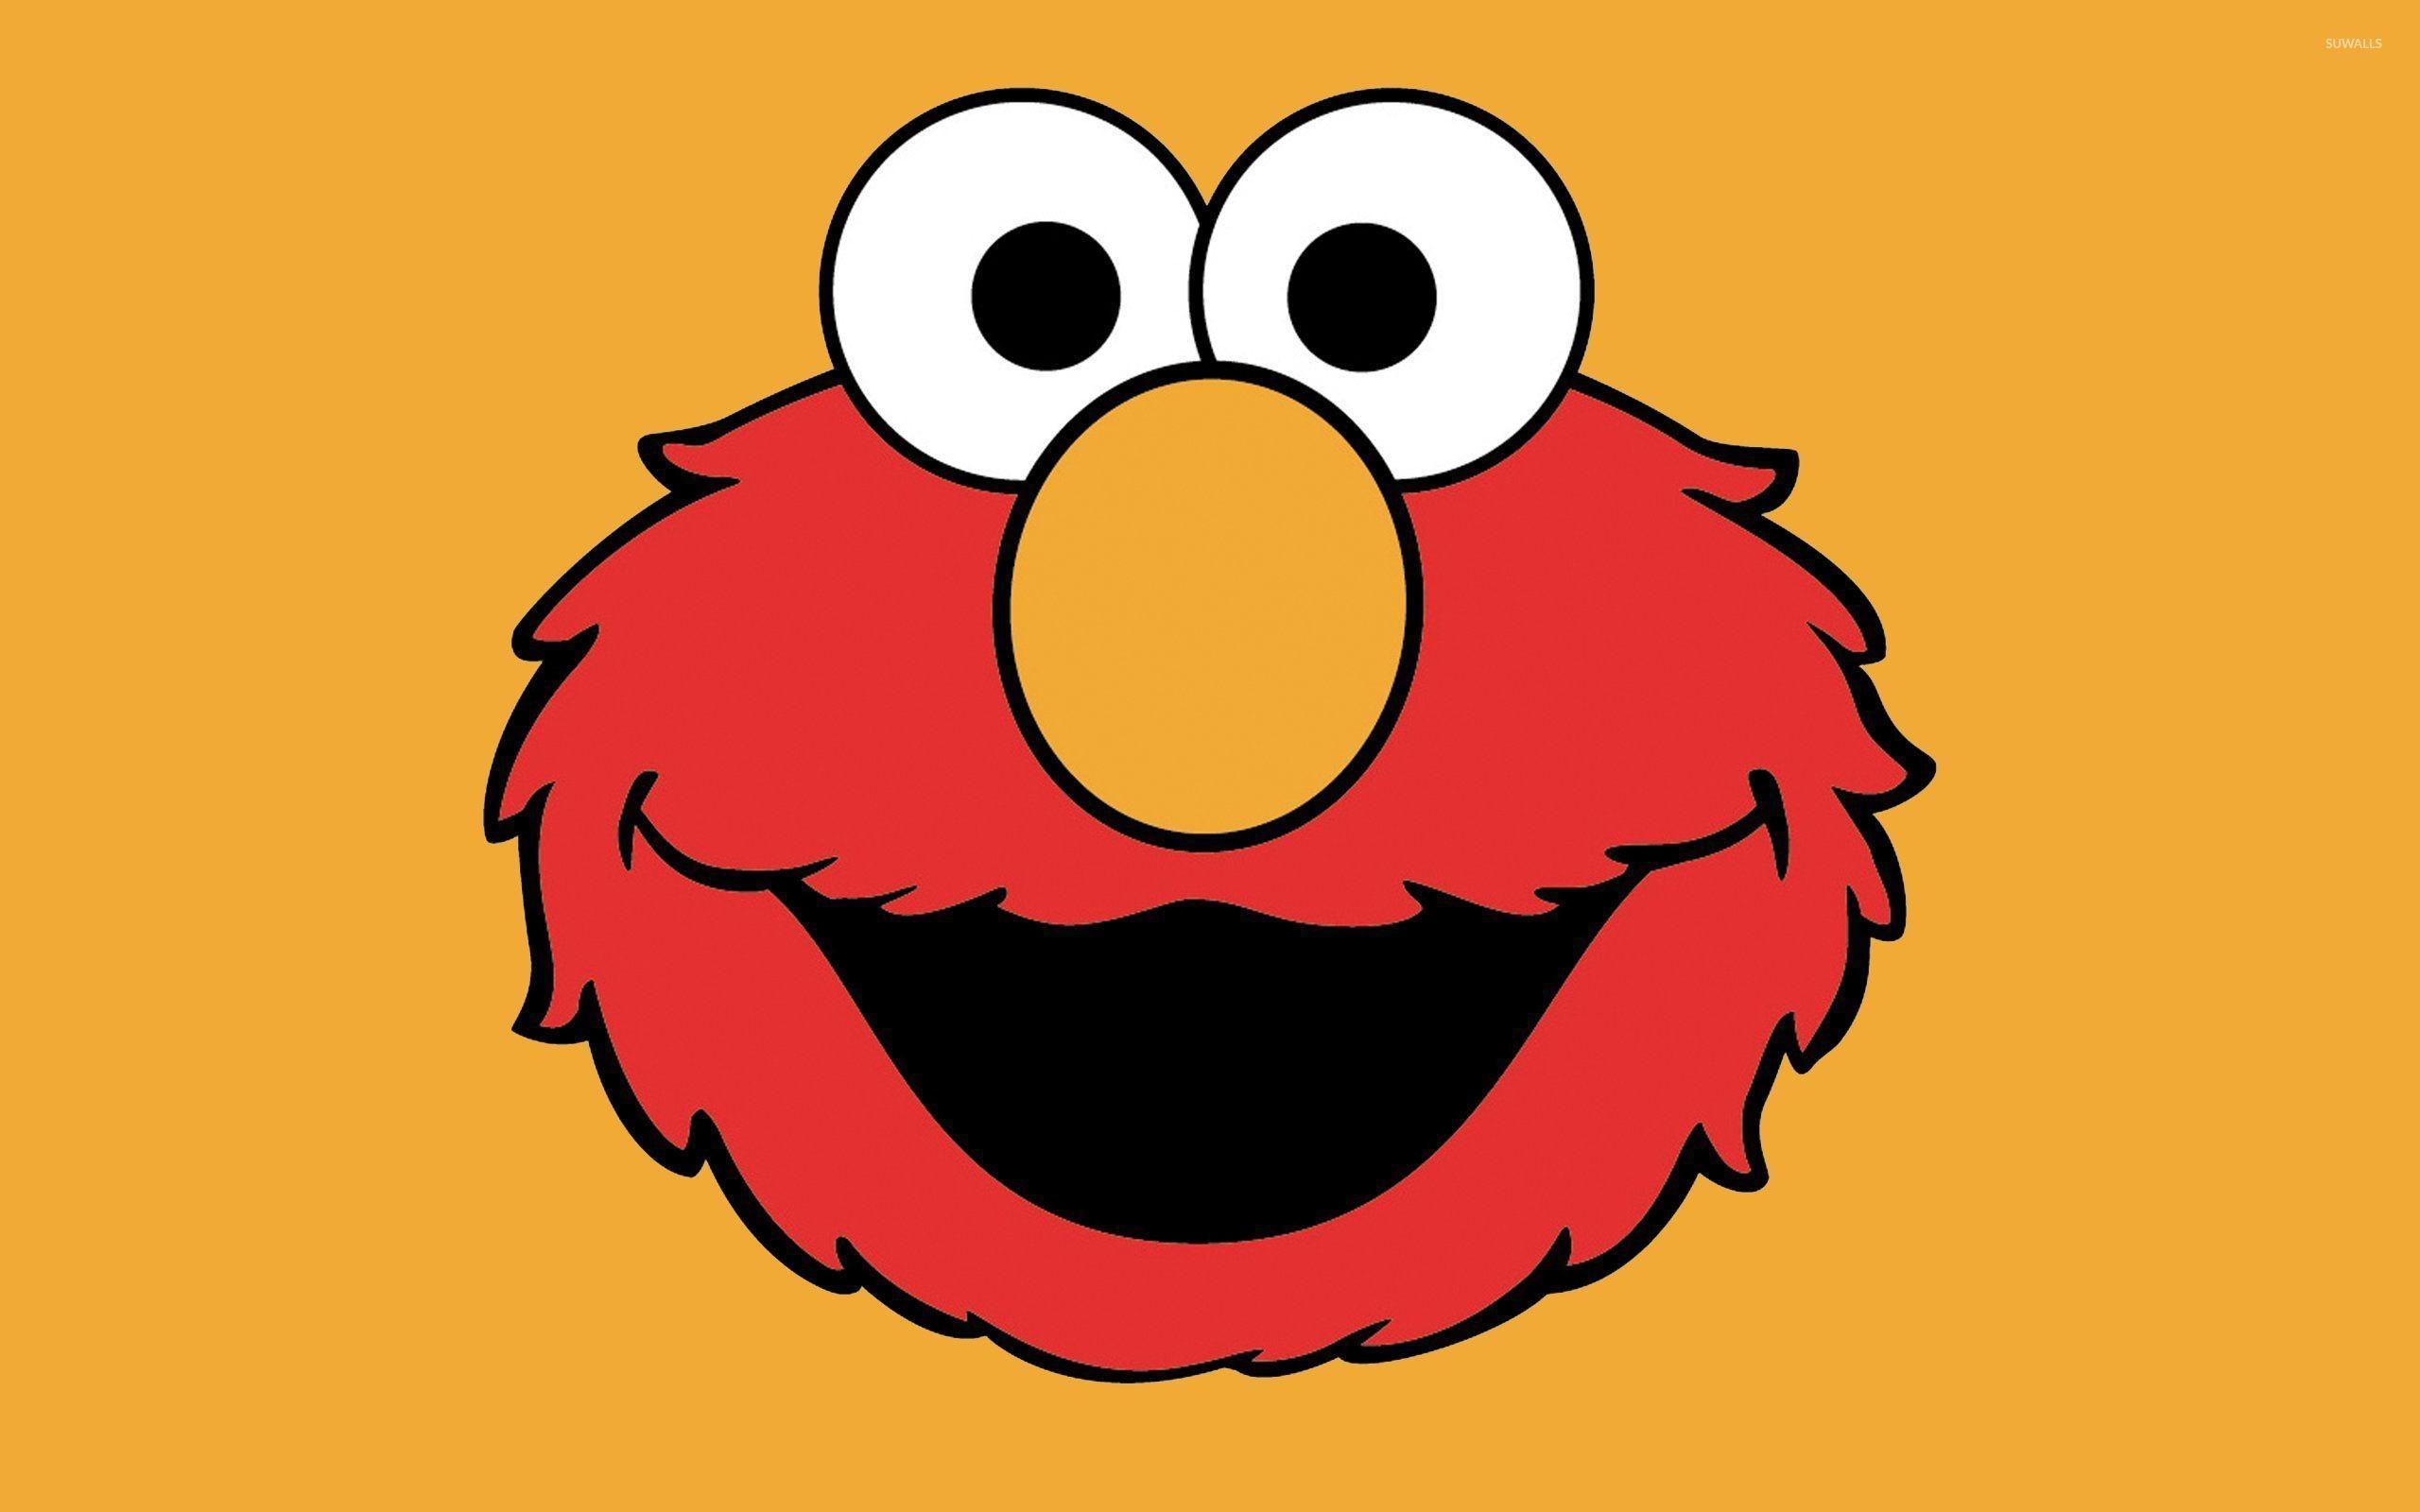 Dibujos Para Colorear De Elmo Bebe: Wallpaper Elmo Tumblr (45+ Images